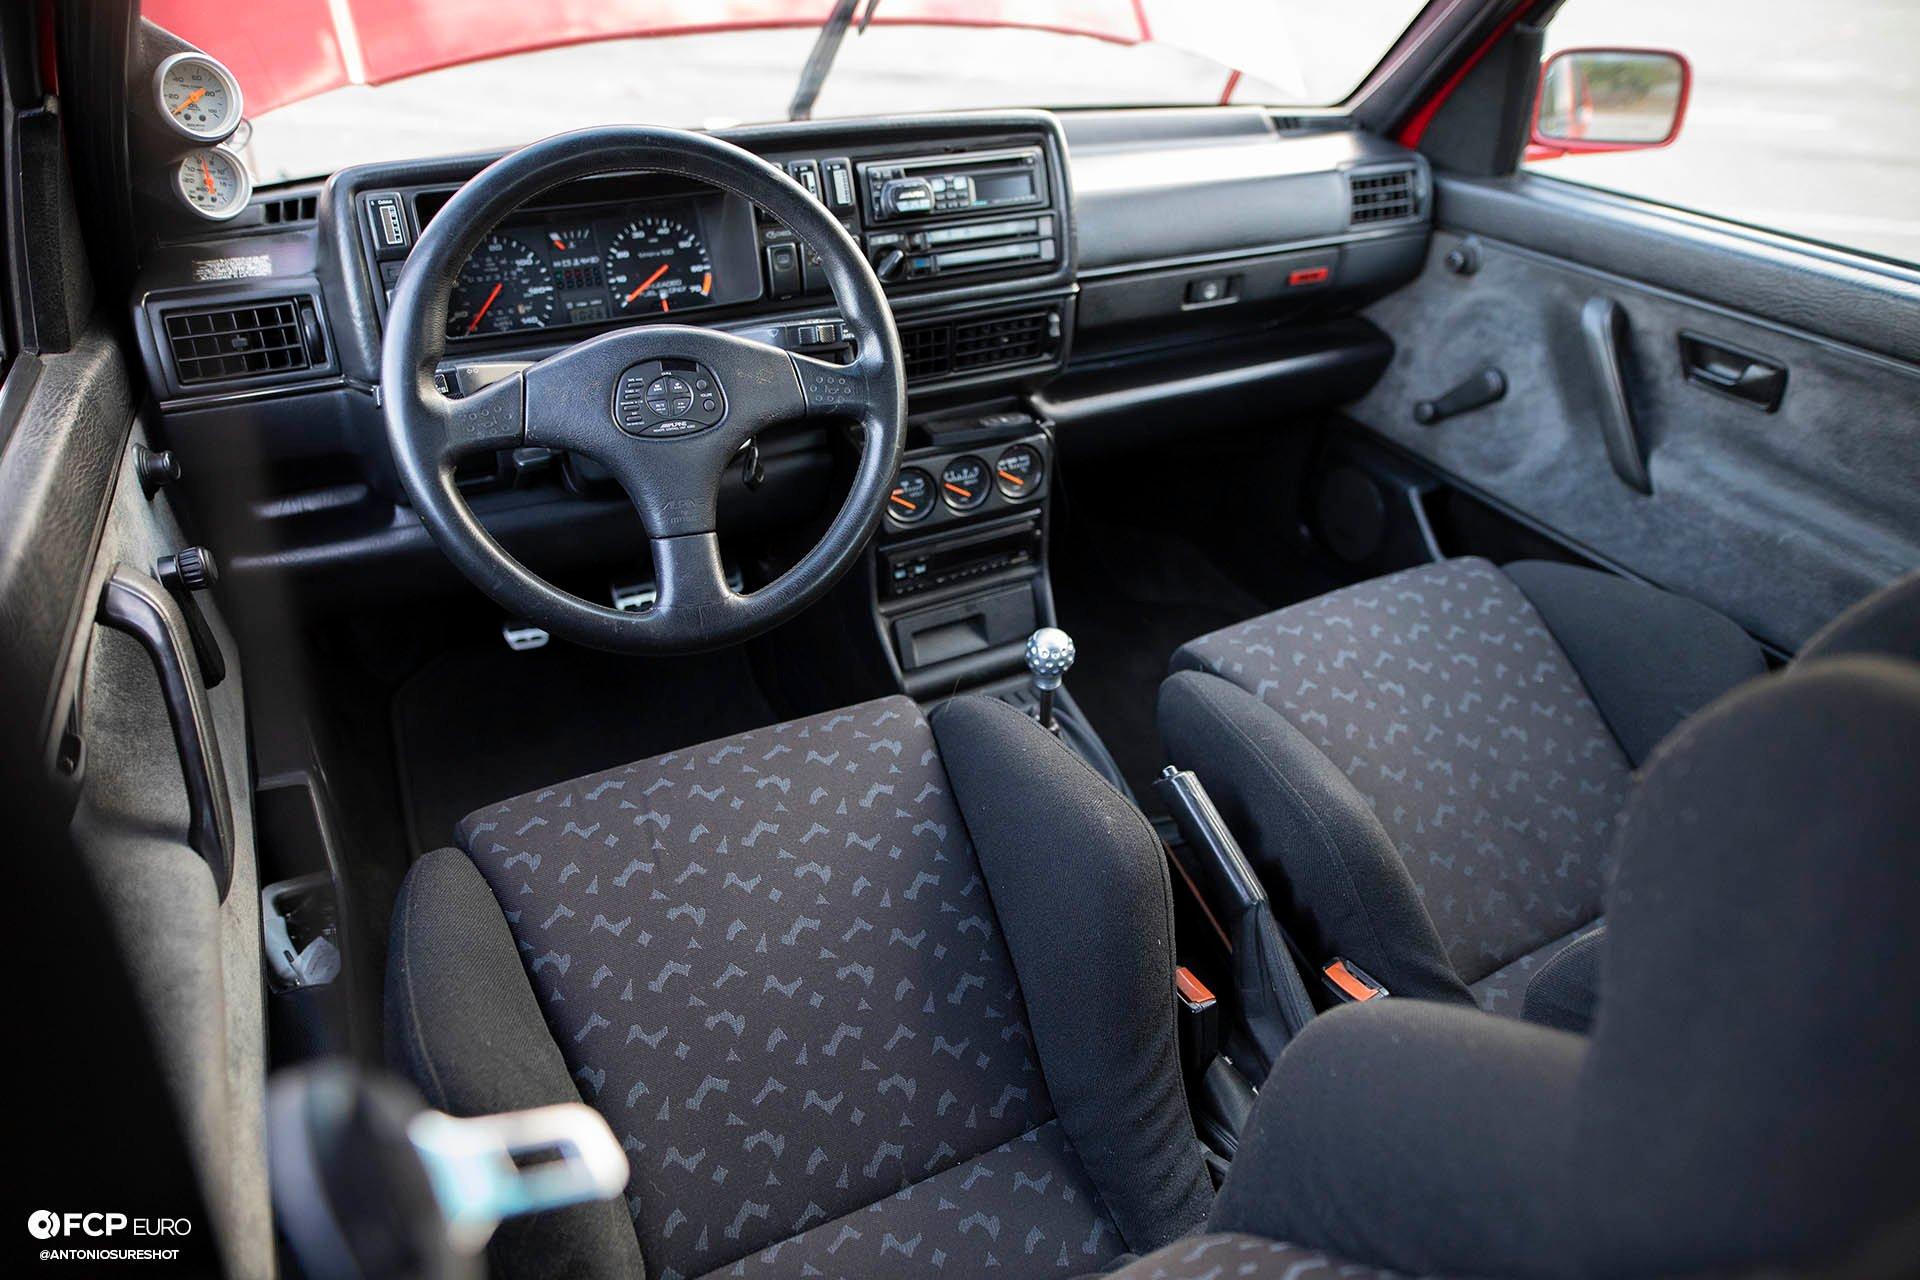 Volkswagen Jetta GLI 16V Westside Mexico Big Euro